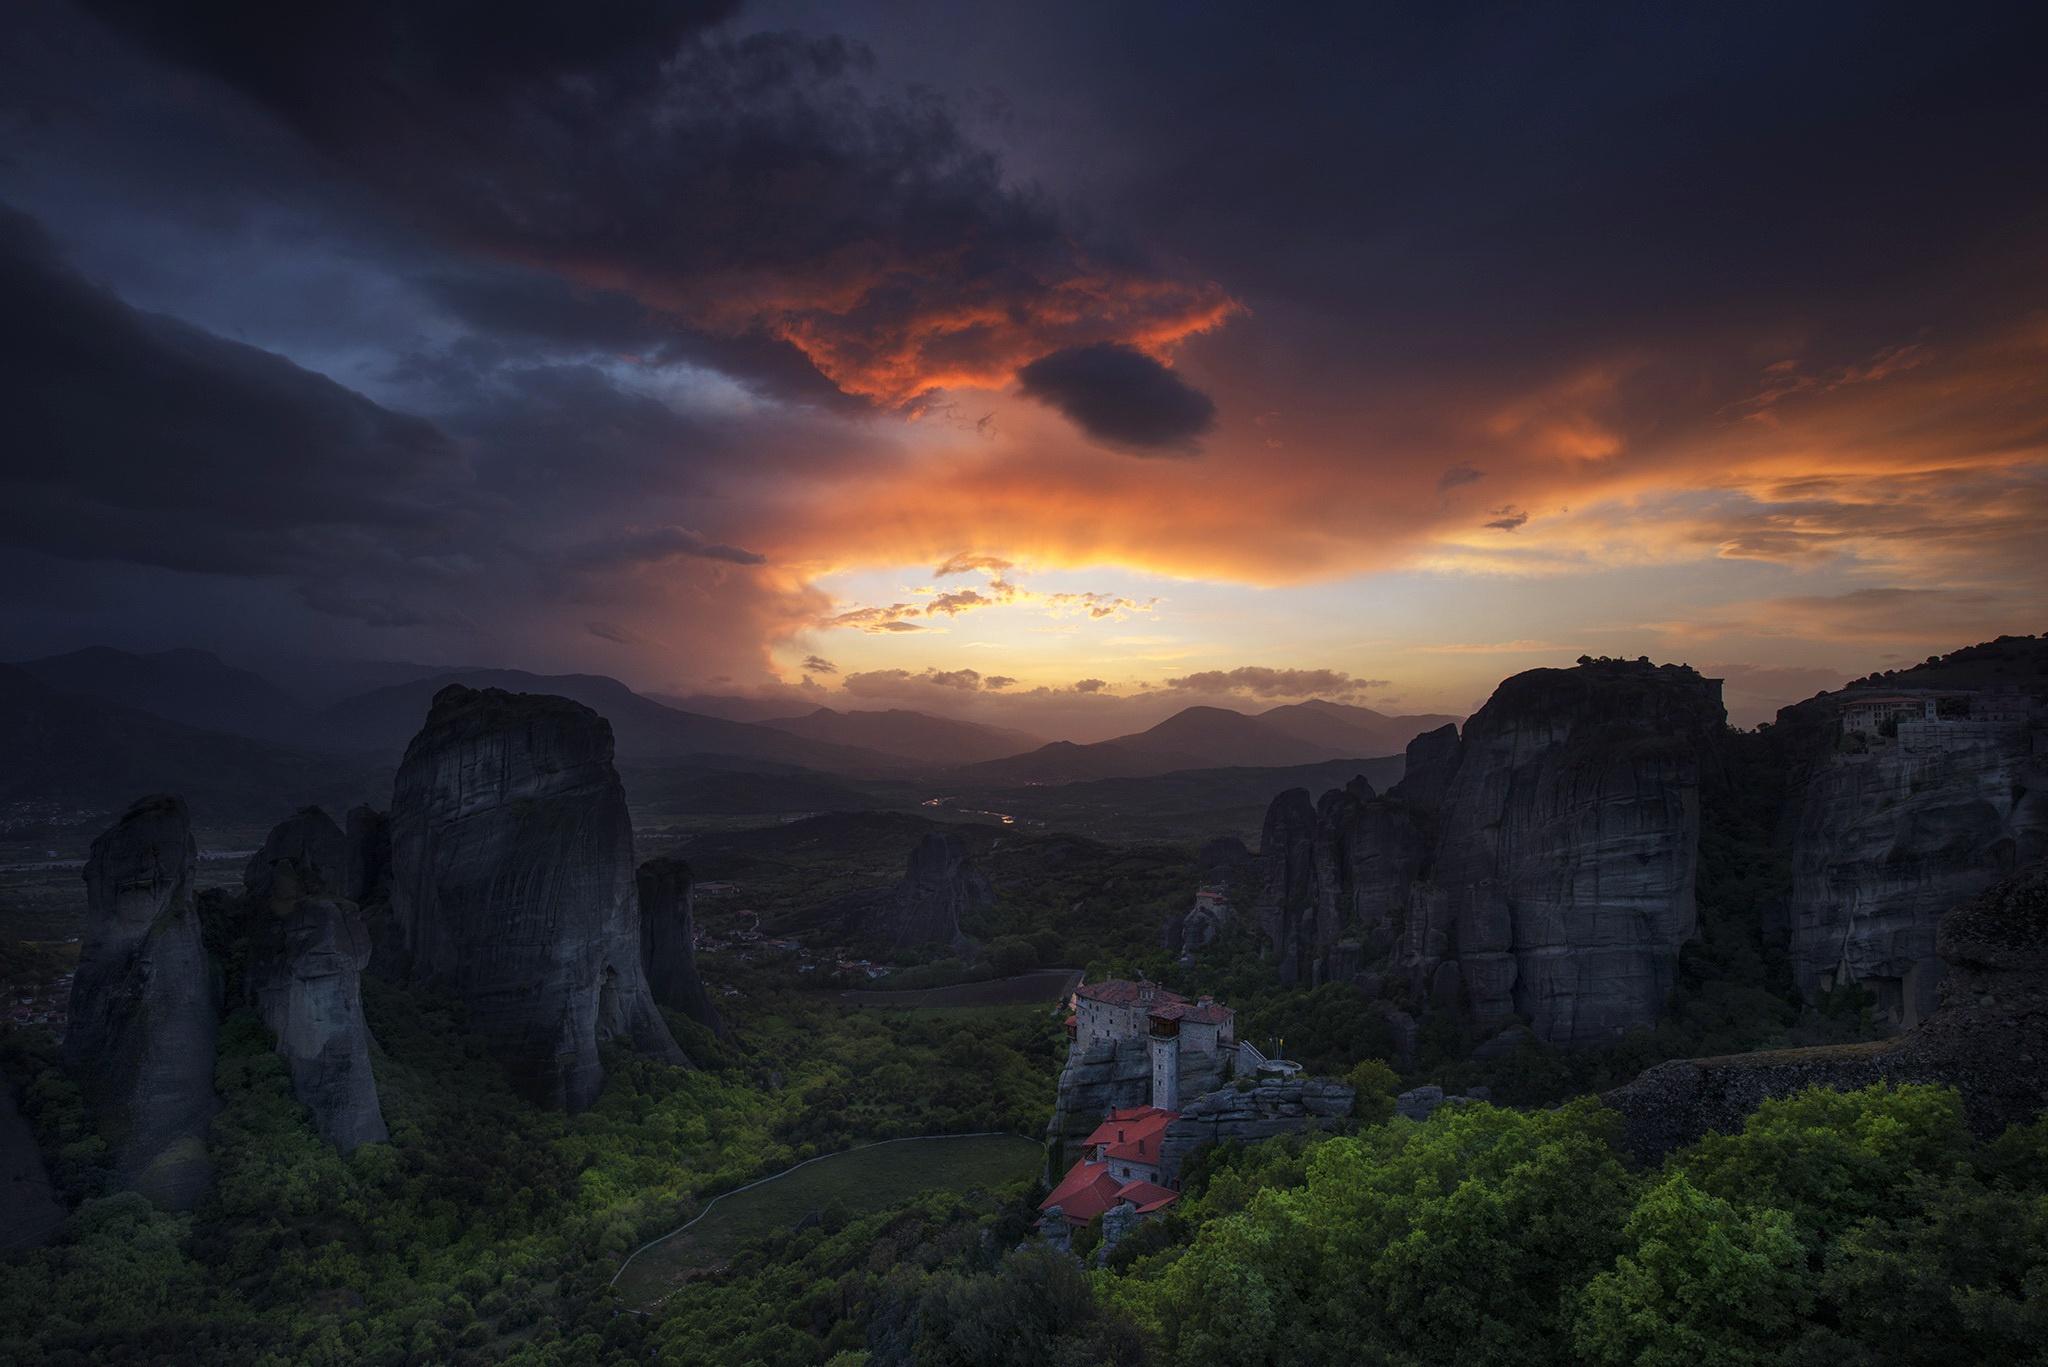 General 2048x1367 sky sky sunlight Kalampaka Greece landscape nature Meteora